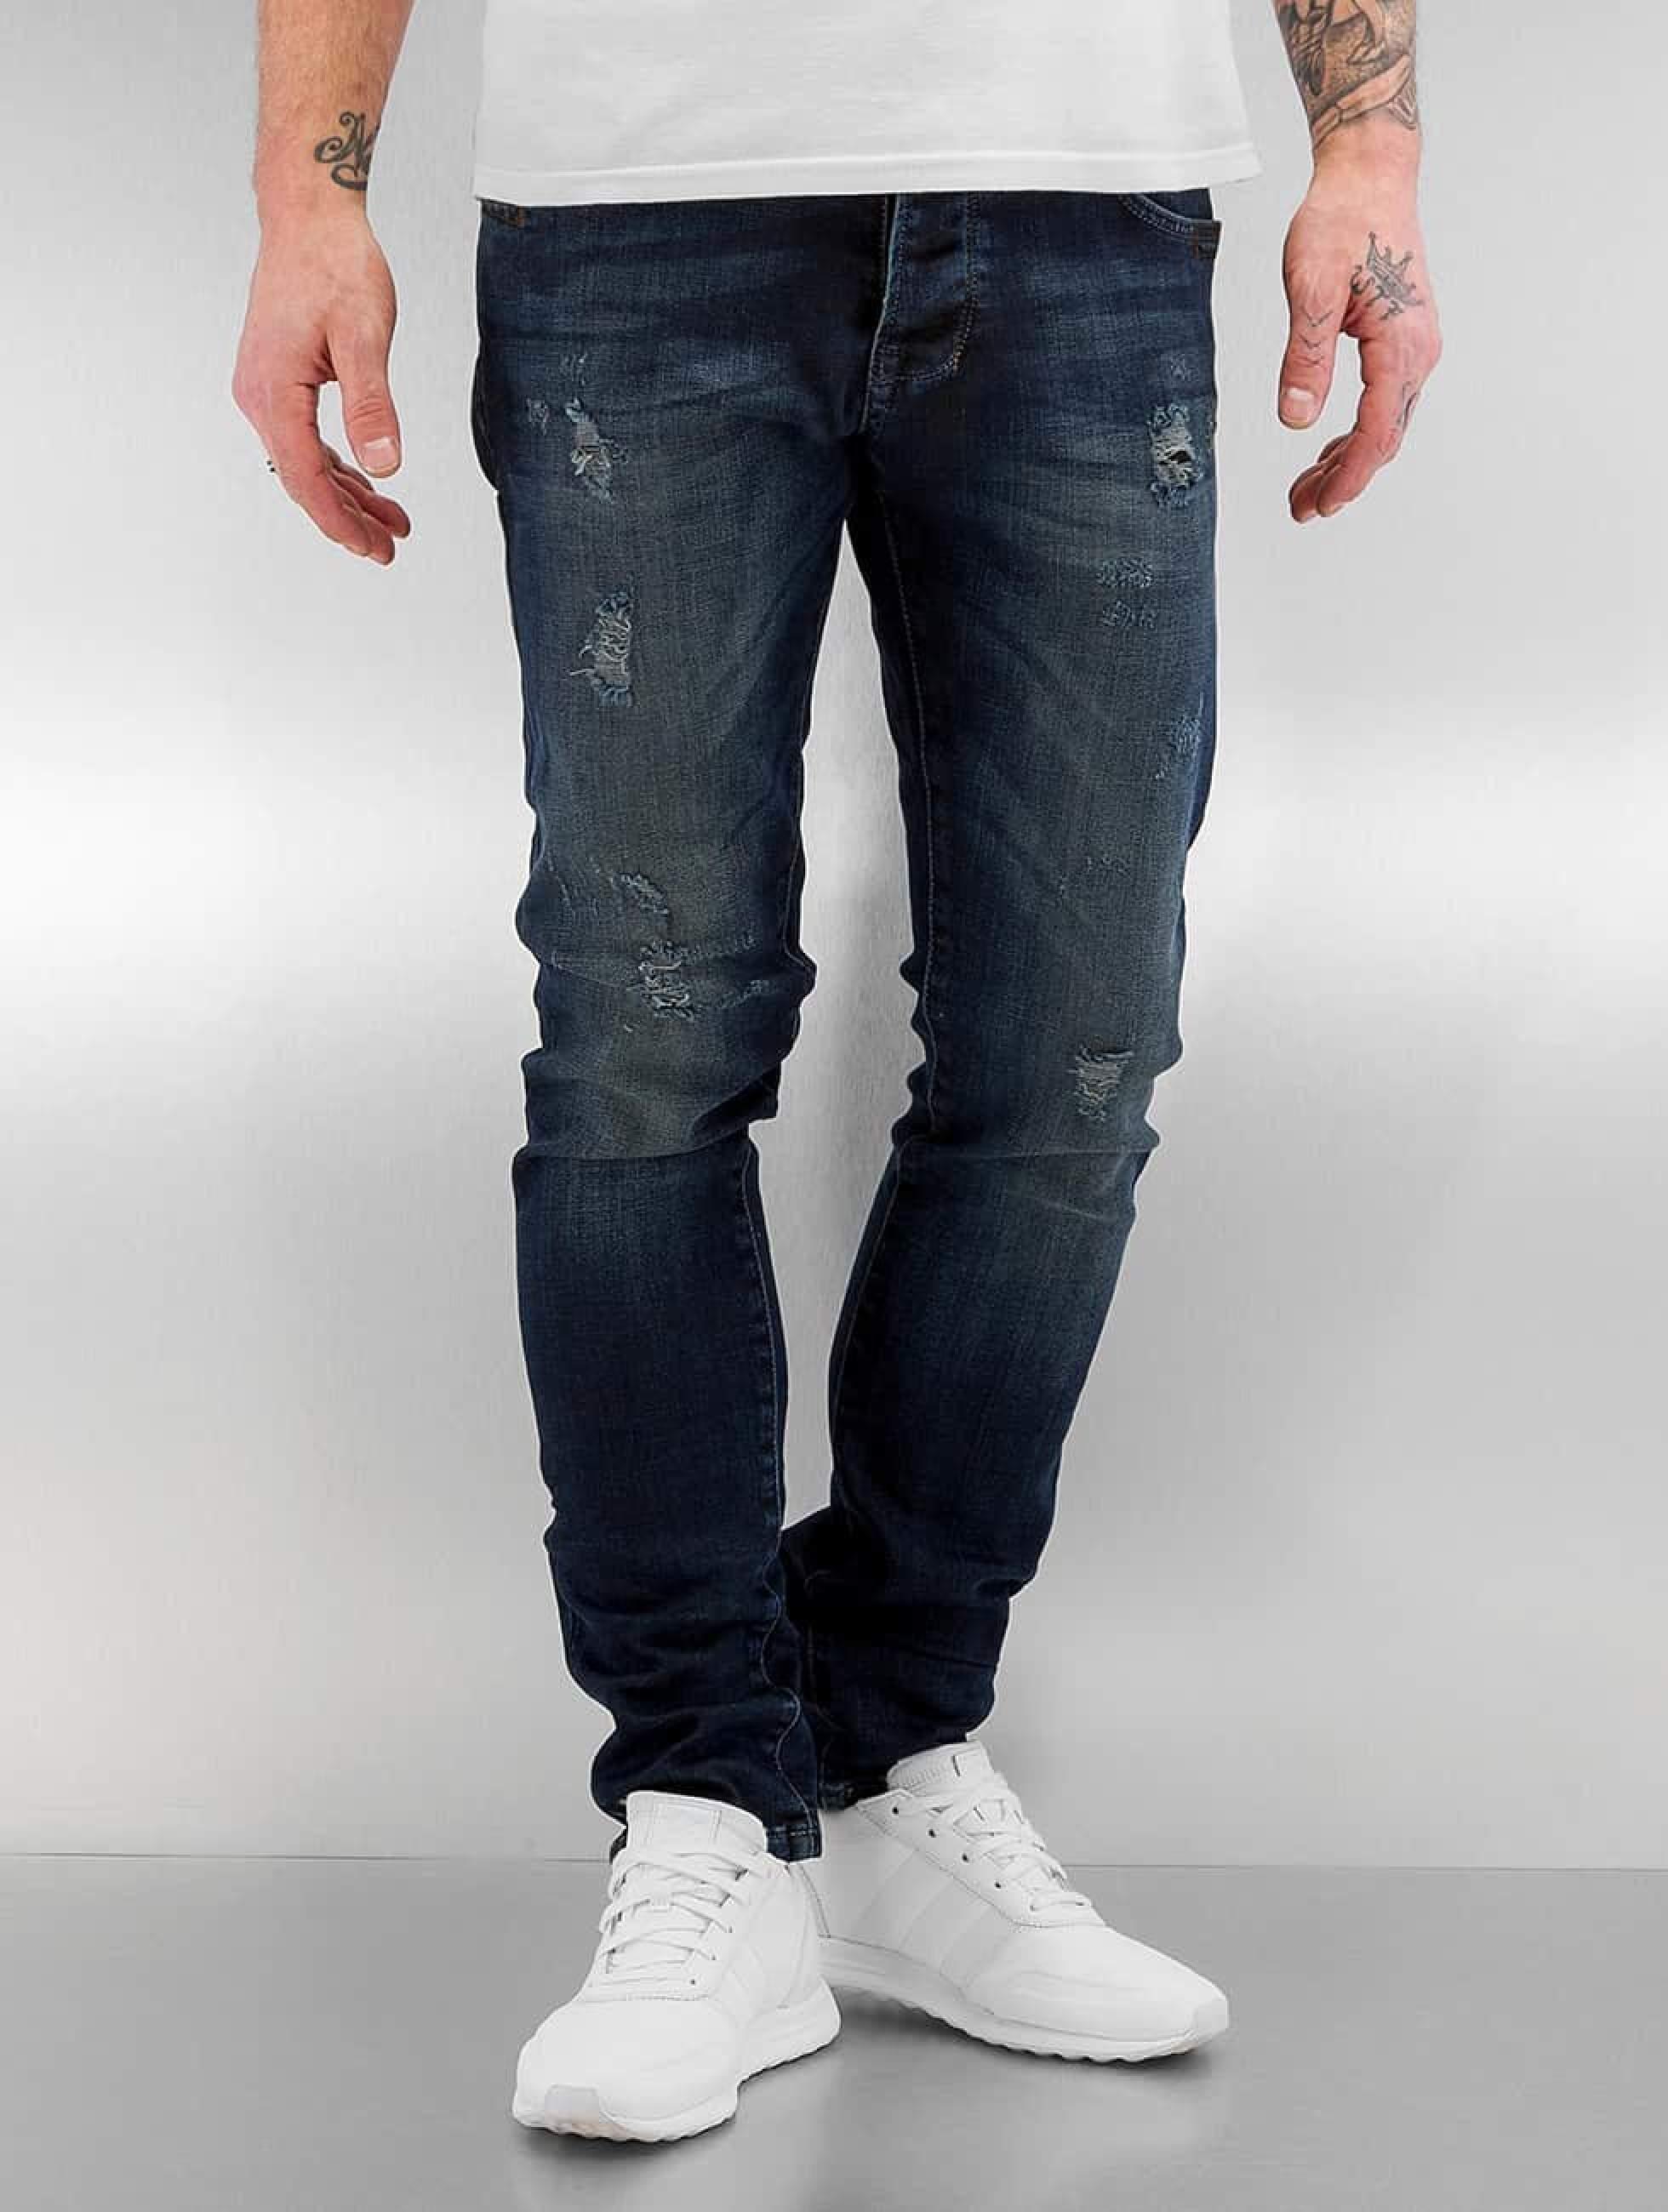 2Y / Skinny Jeans Glasgow in blue W 29